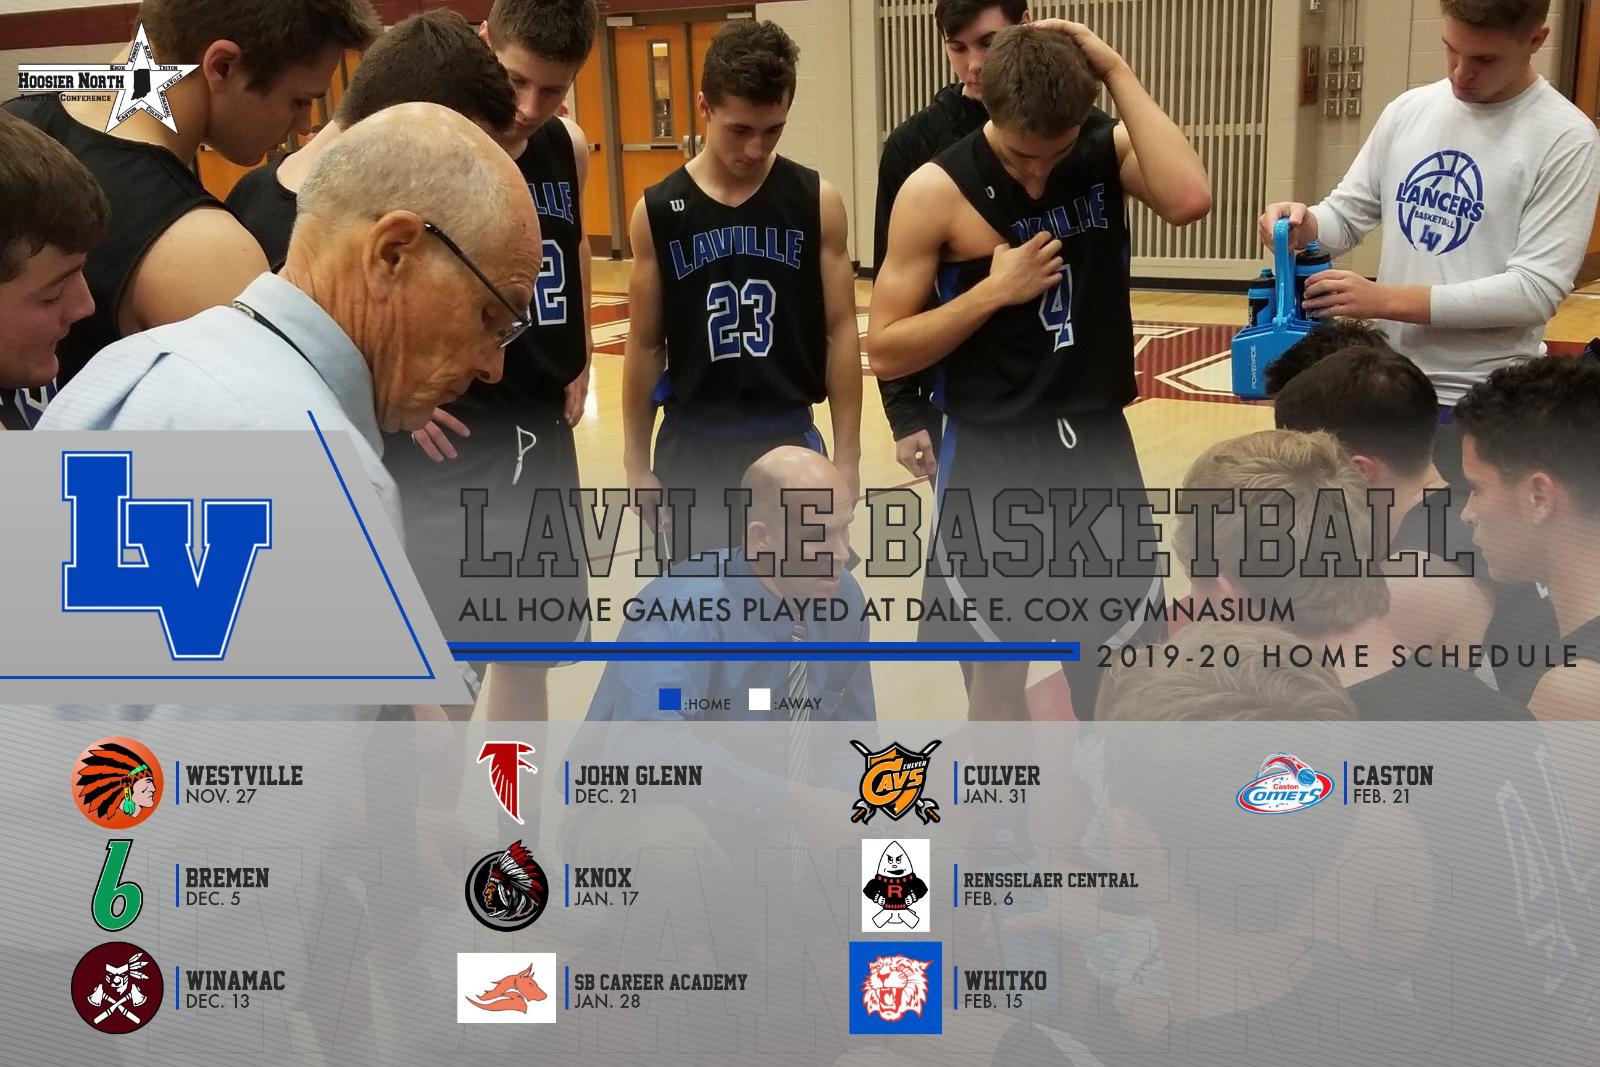 LaVille Basketball To Open Season November 27